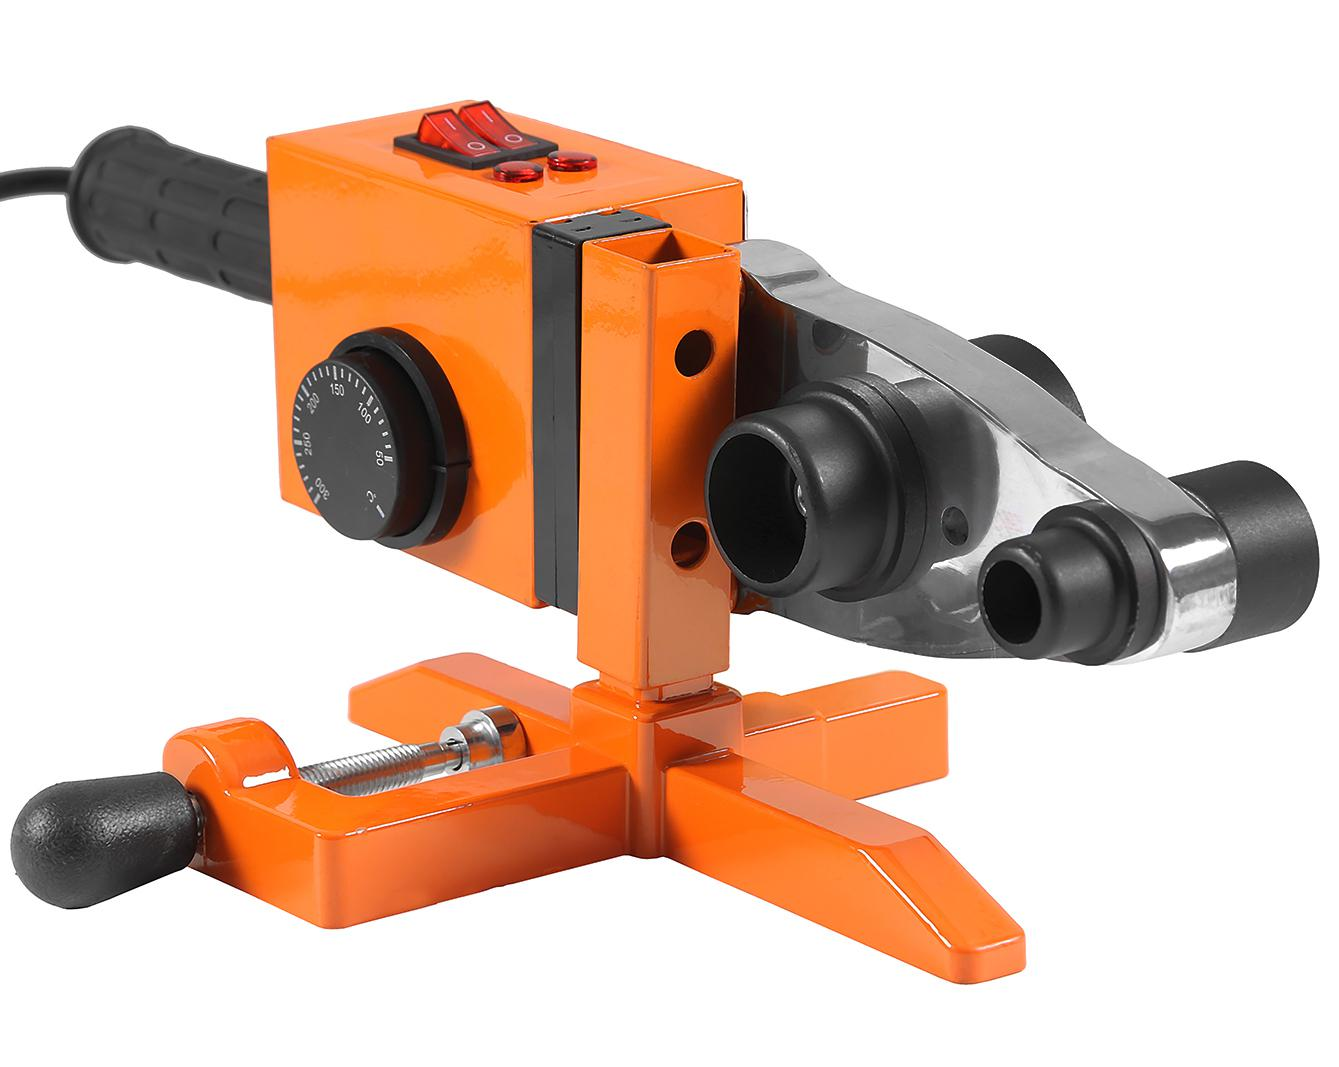 Аппарат для сварки пластиковых труб Wester Dwm 1500 аппарат для сварки полипропиленовых труб bort brs 2000